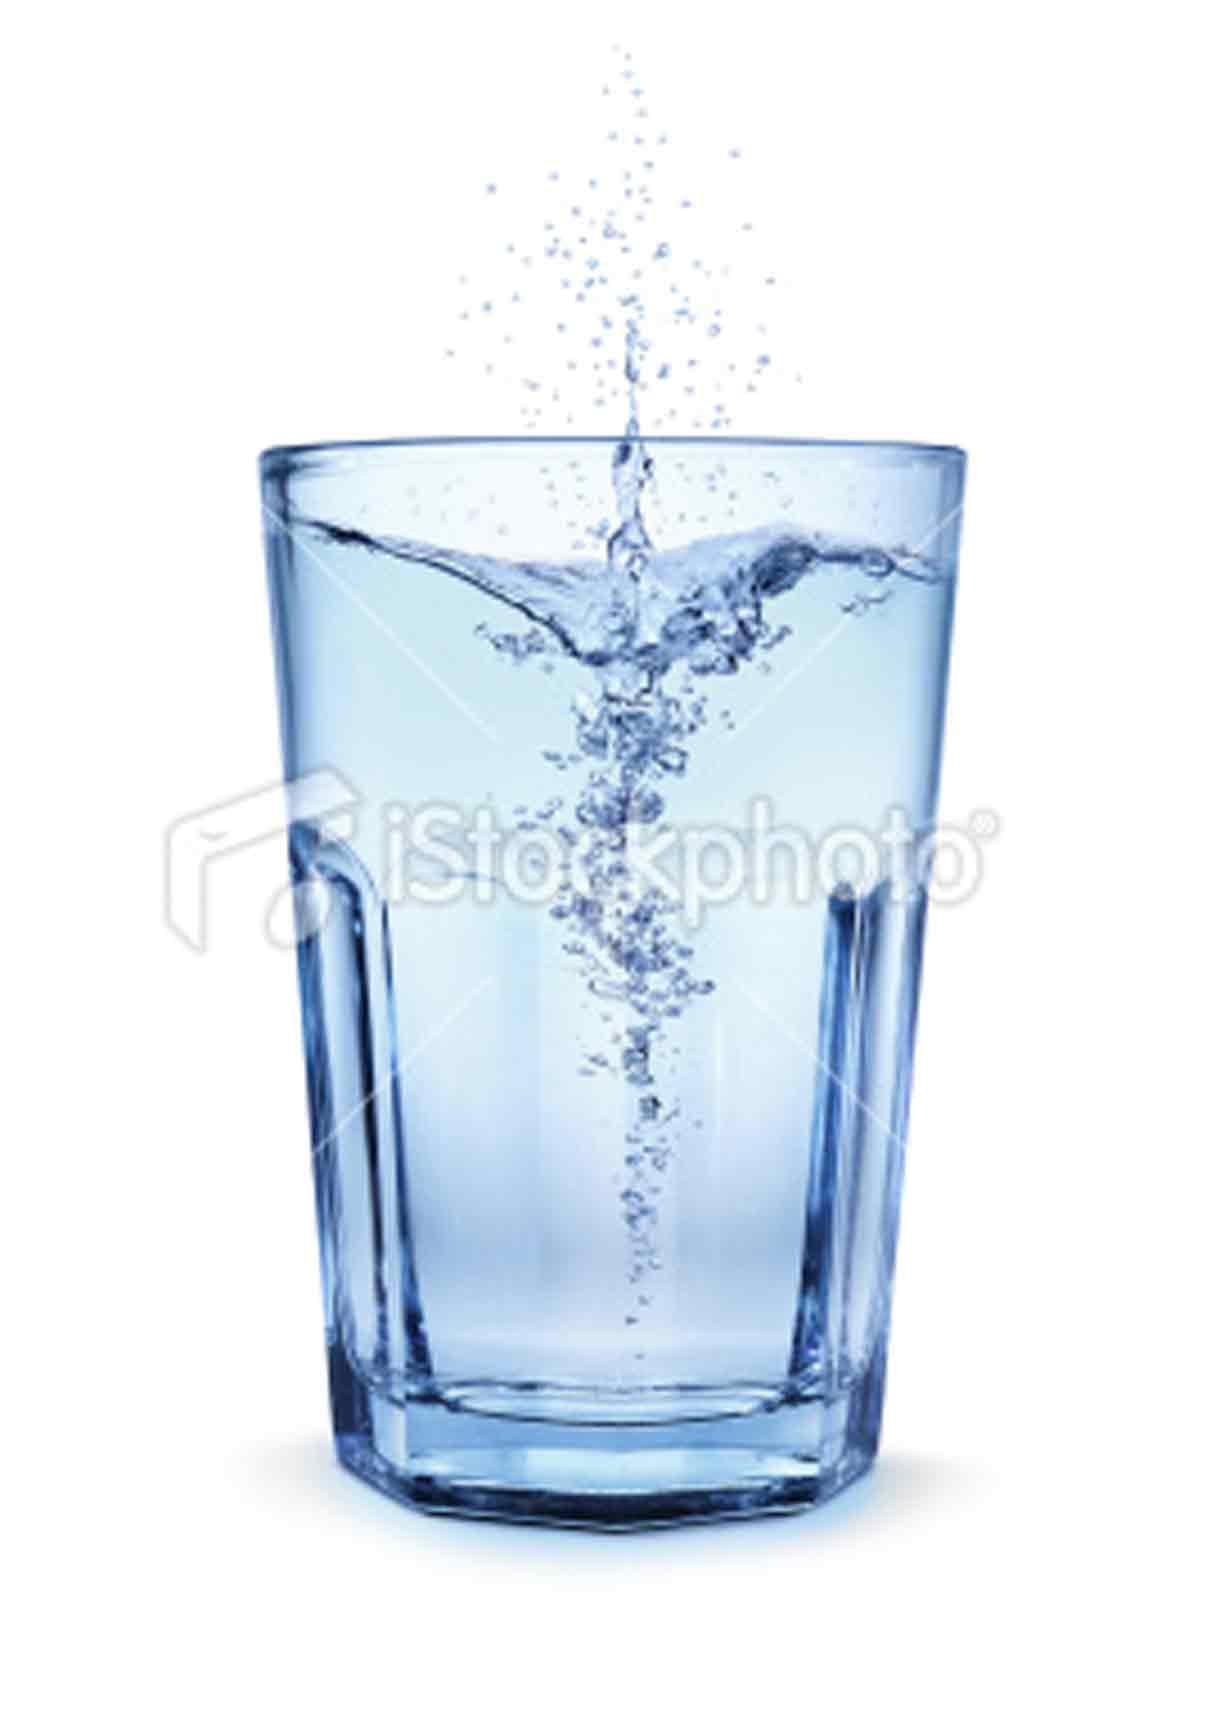 Drinking Salt Water Cat